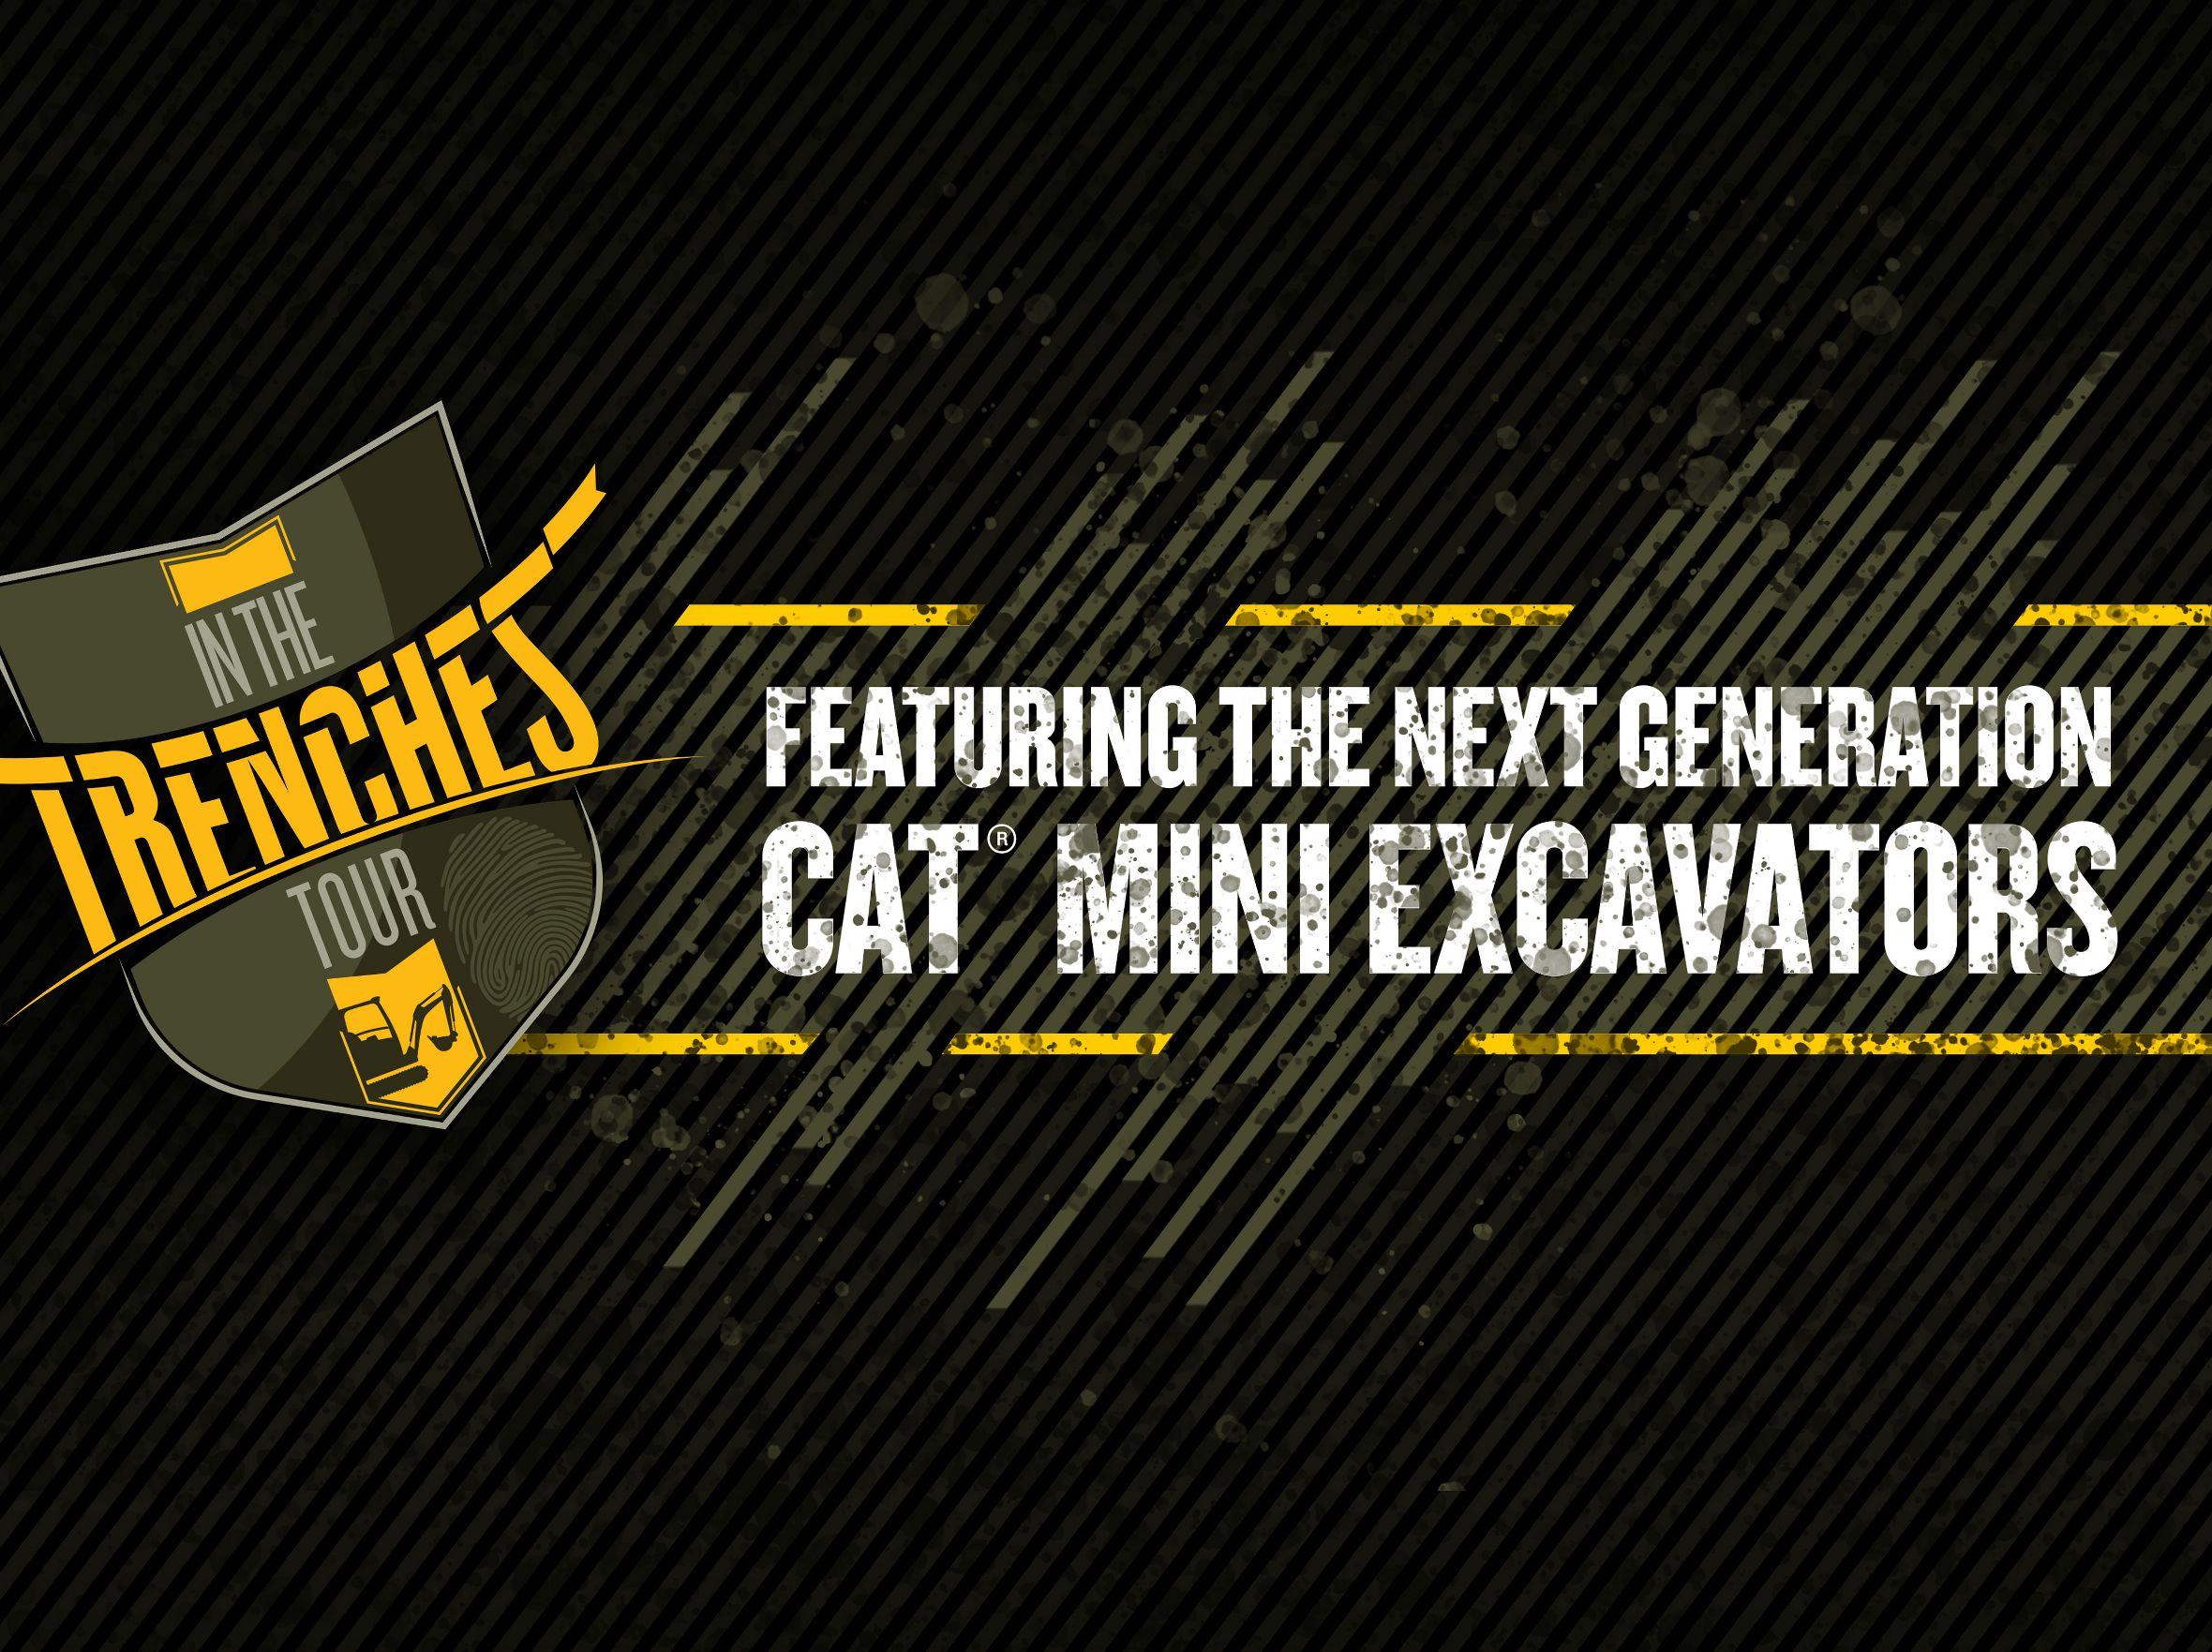 In the Trenches Tour Featuring Next Generation Cat® mini excavators